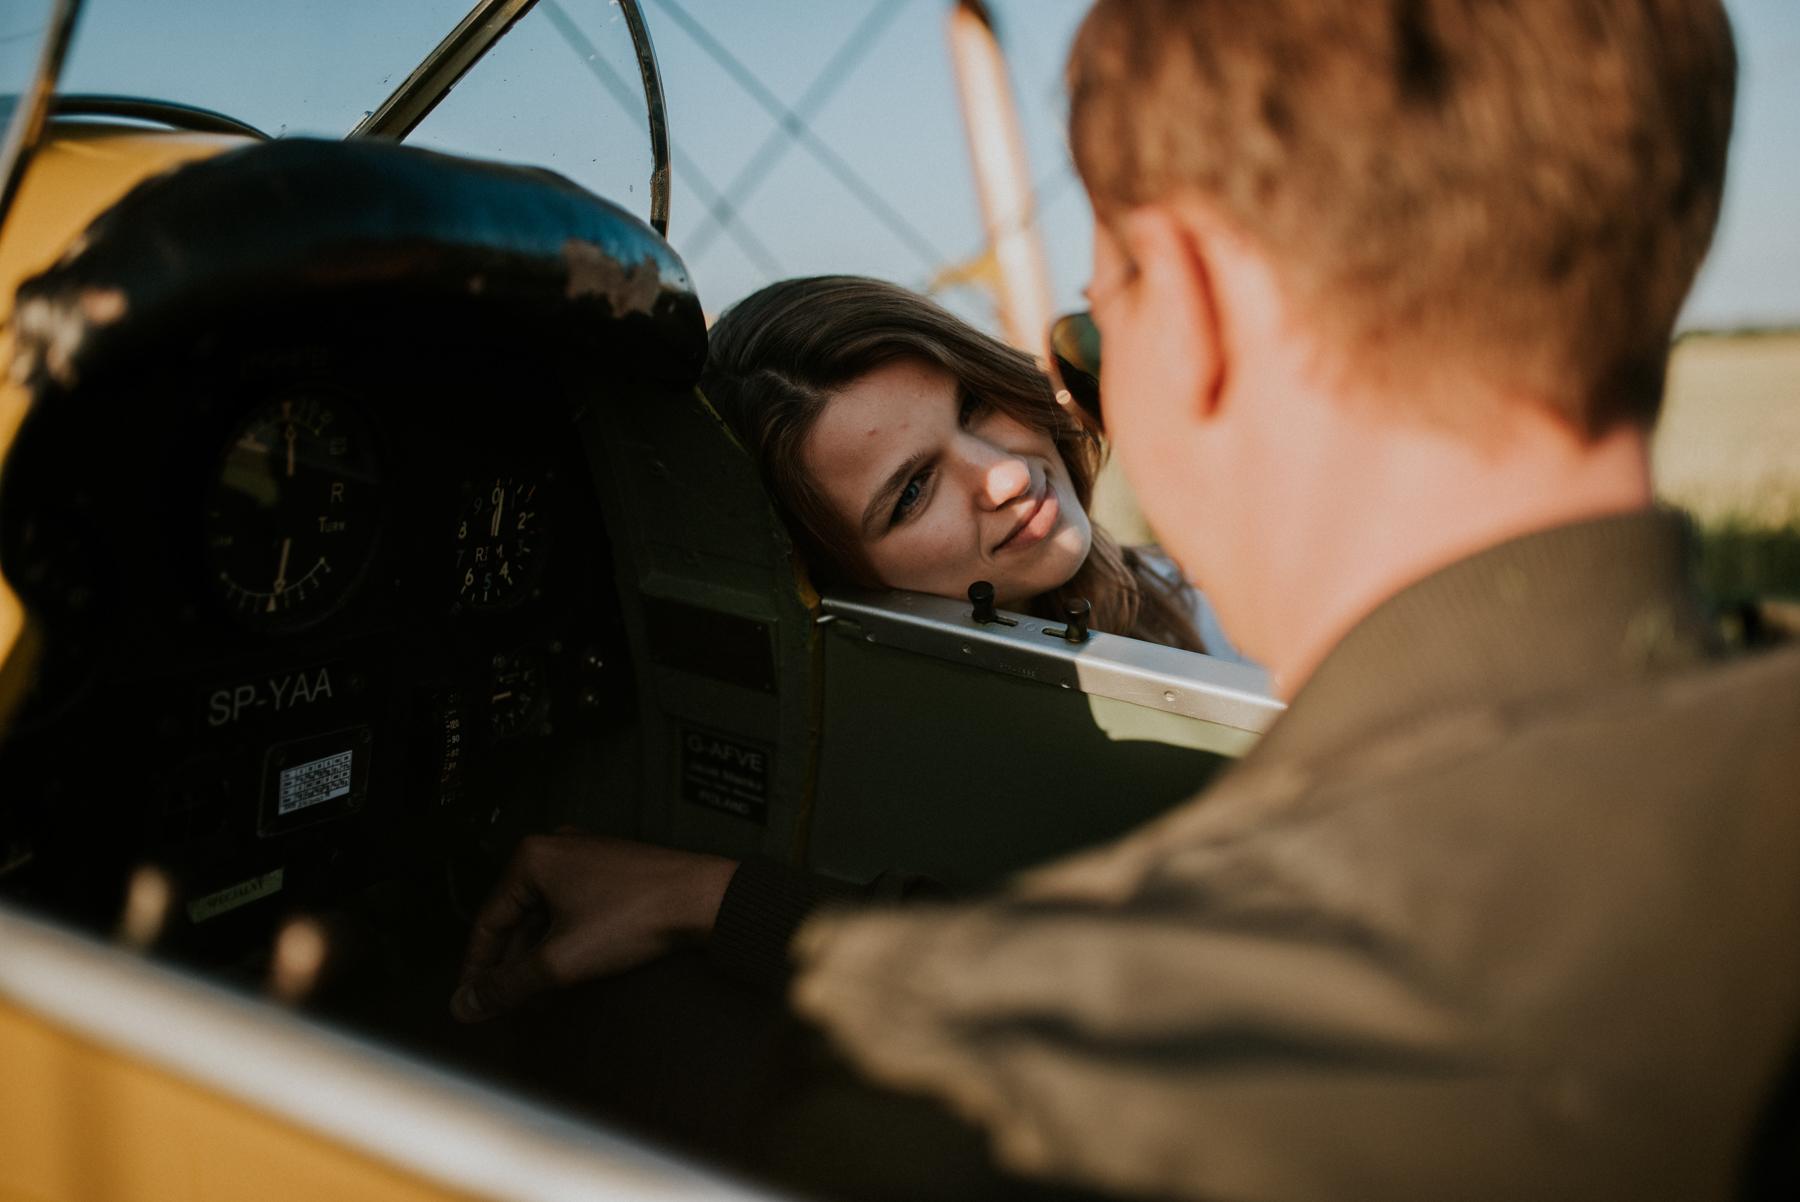 sesja na lotnisku, sesja narzeczeńśka, samolot, wisienka na torcie, samolot na sesji, pilot samolotu